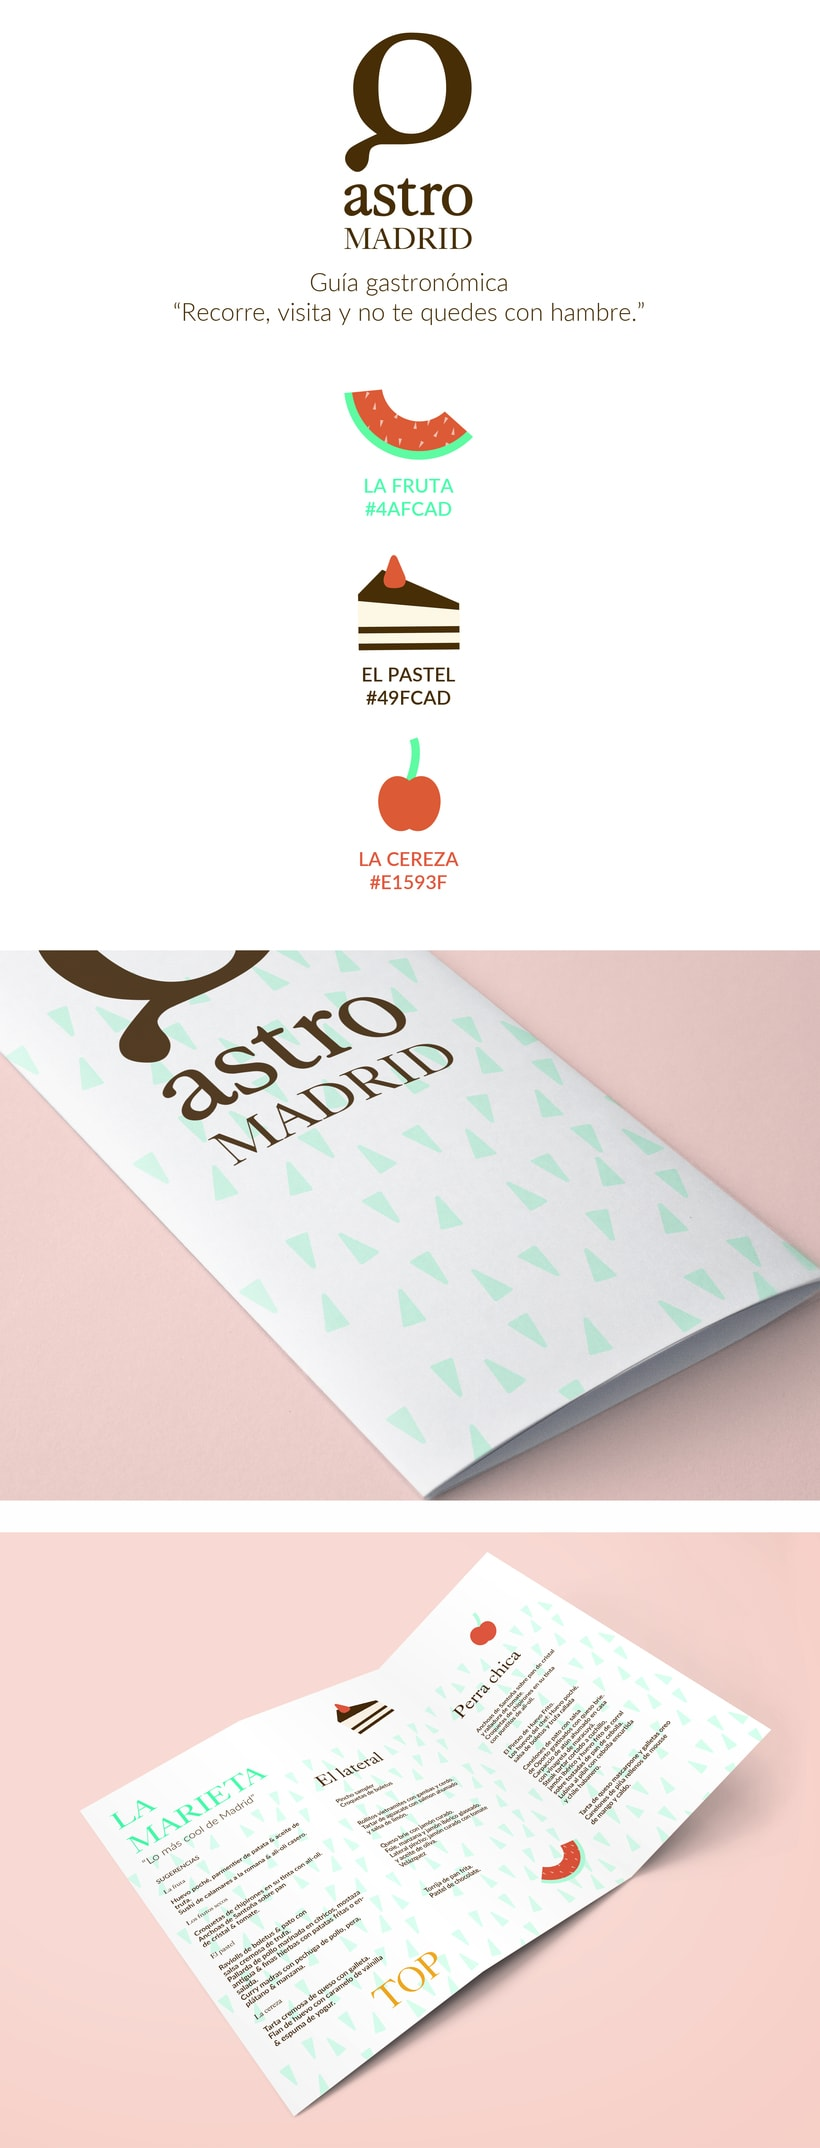 Astro dise o gr fico y editorial domestika for Diseno grafico editorial